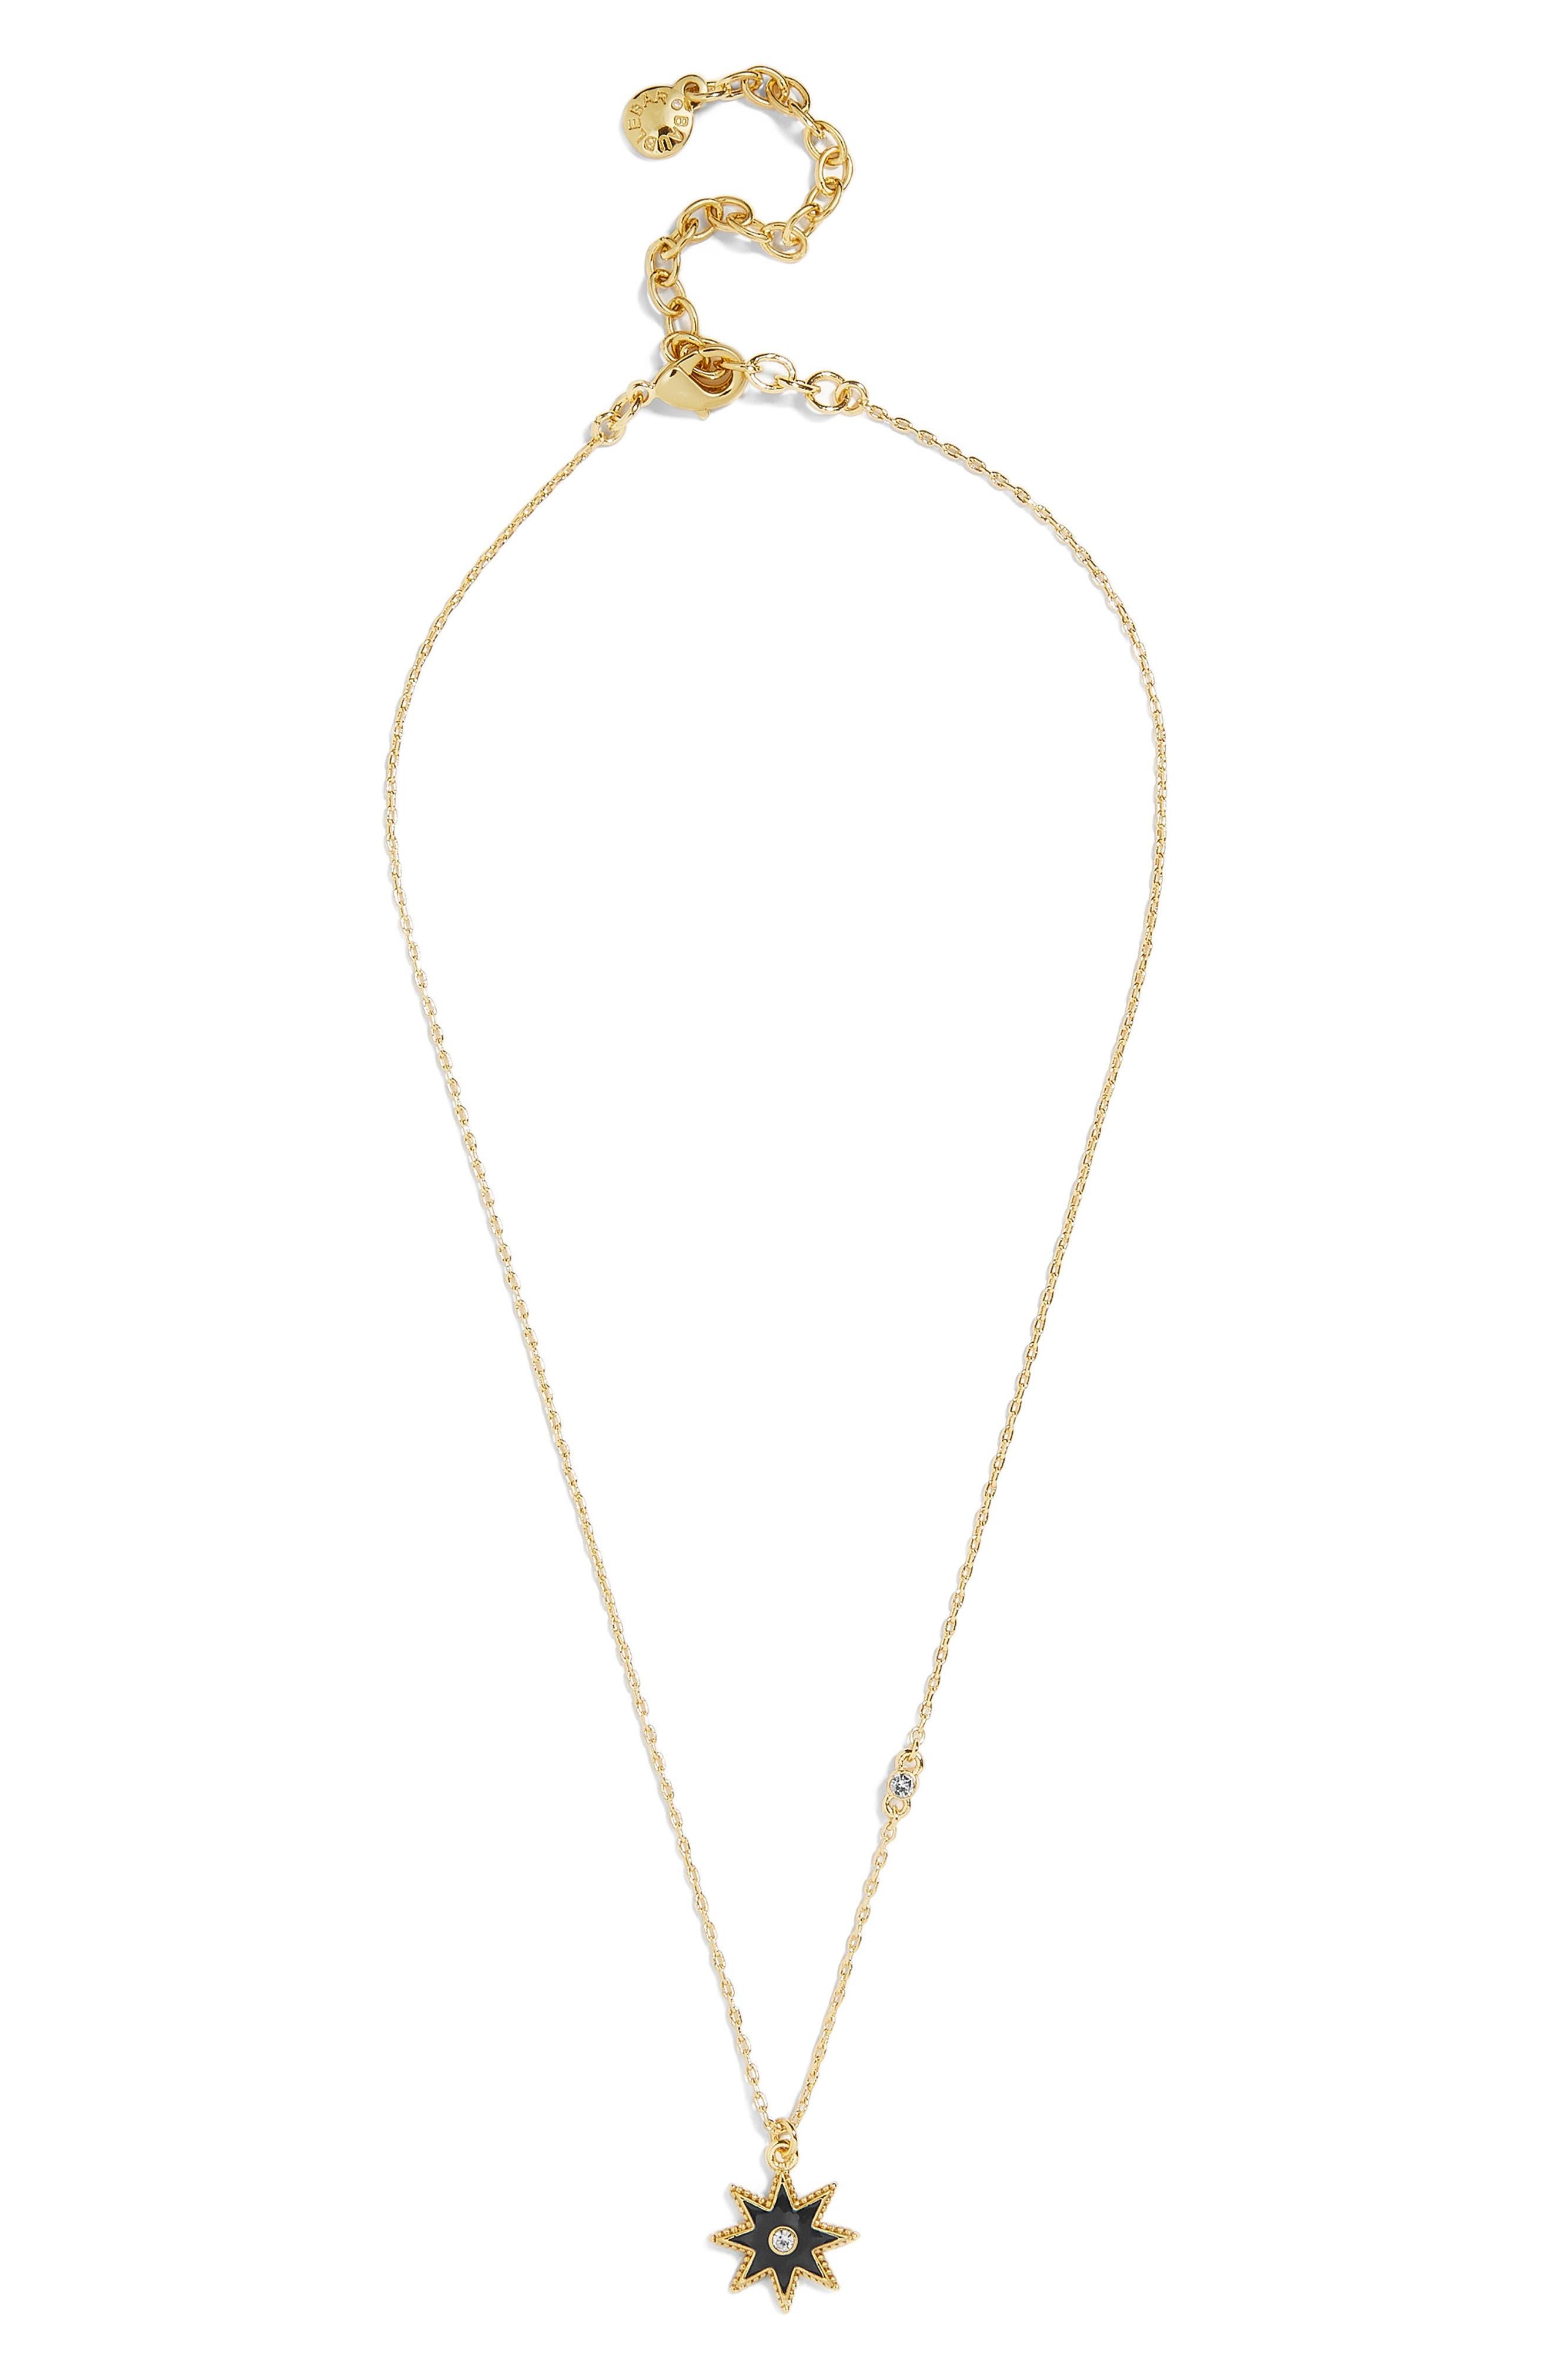 BAUBLEBAR, Merralina Star Pendant Necklace, Main thumbnail 1, color, 710